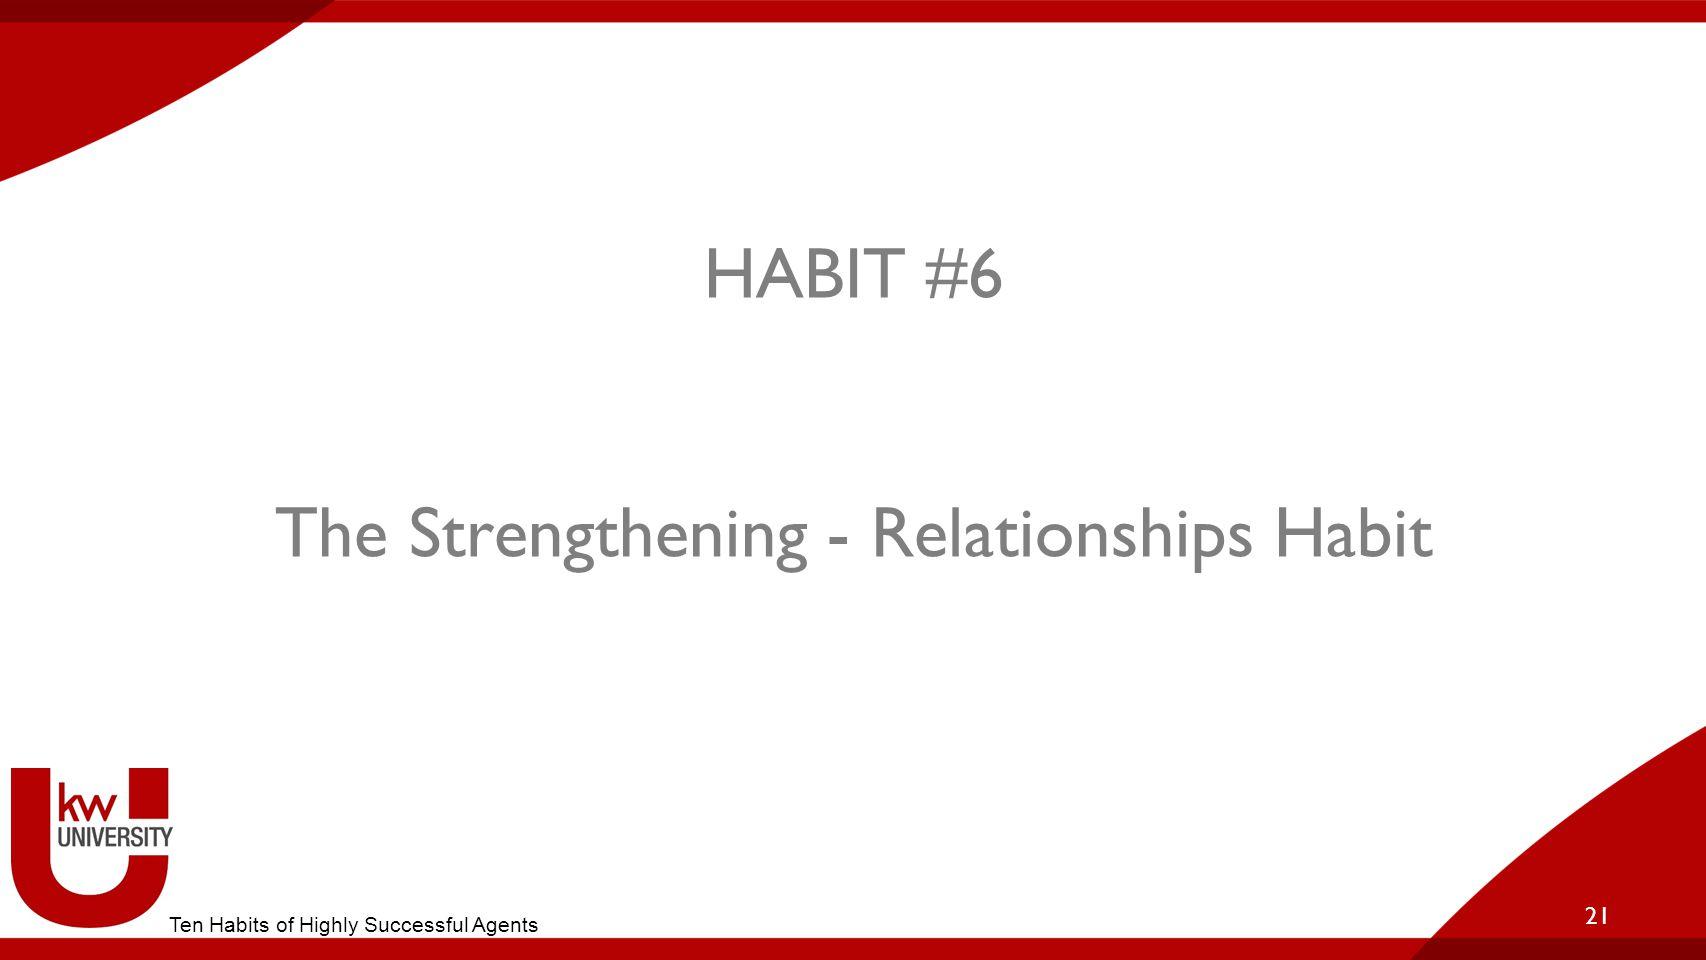 HABIT #6 The Strengthening - Relationships Habit